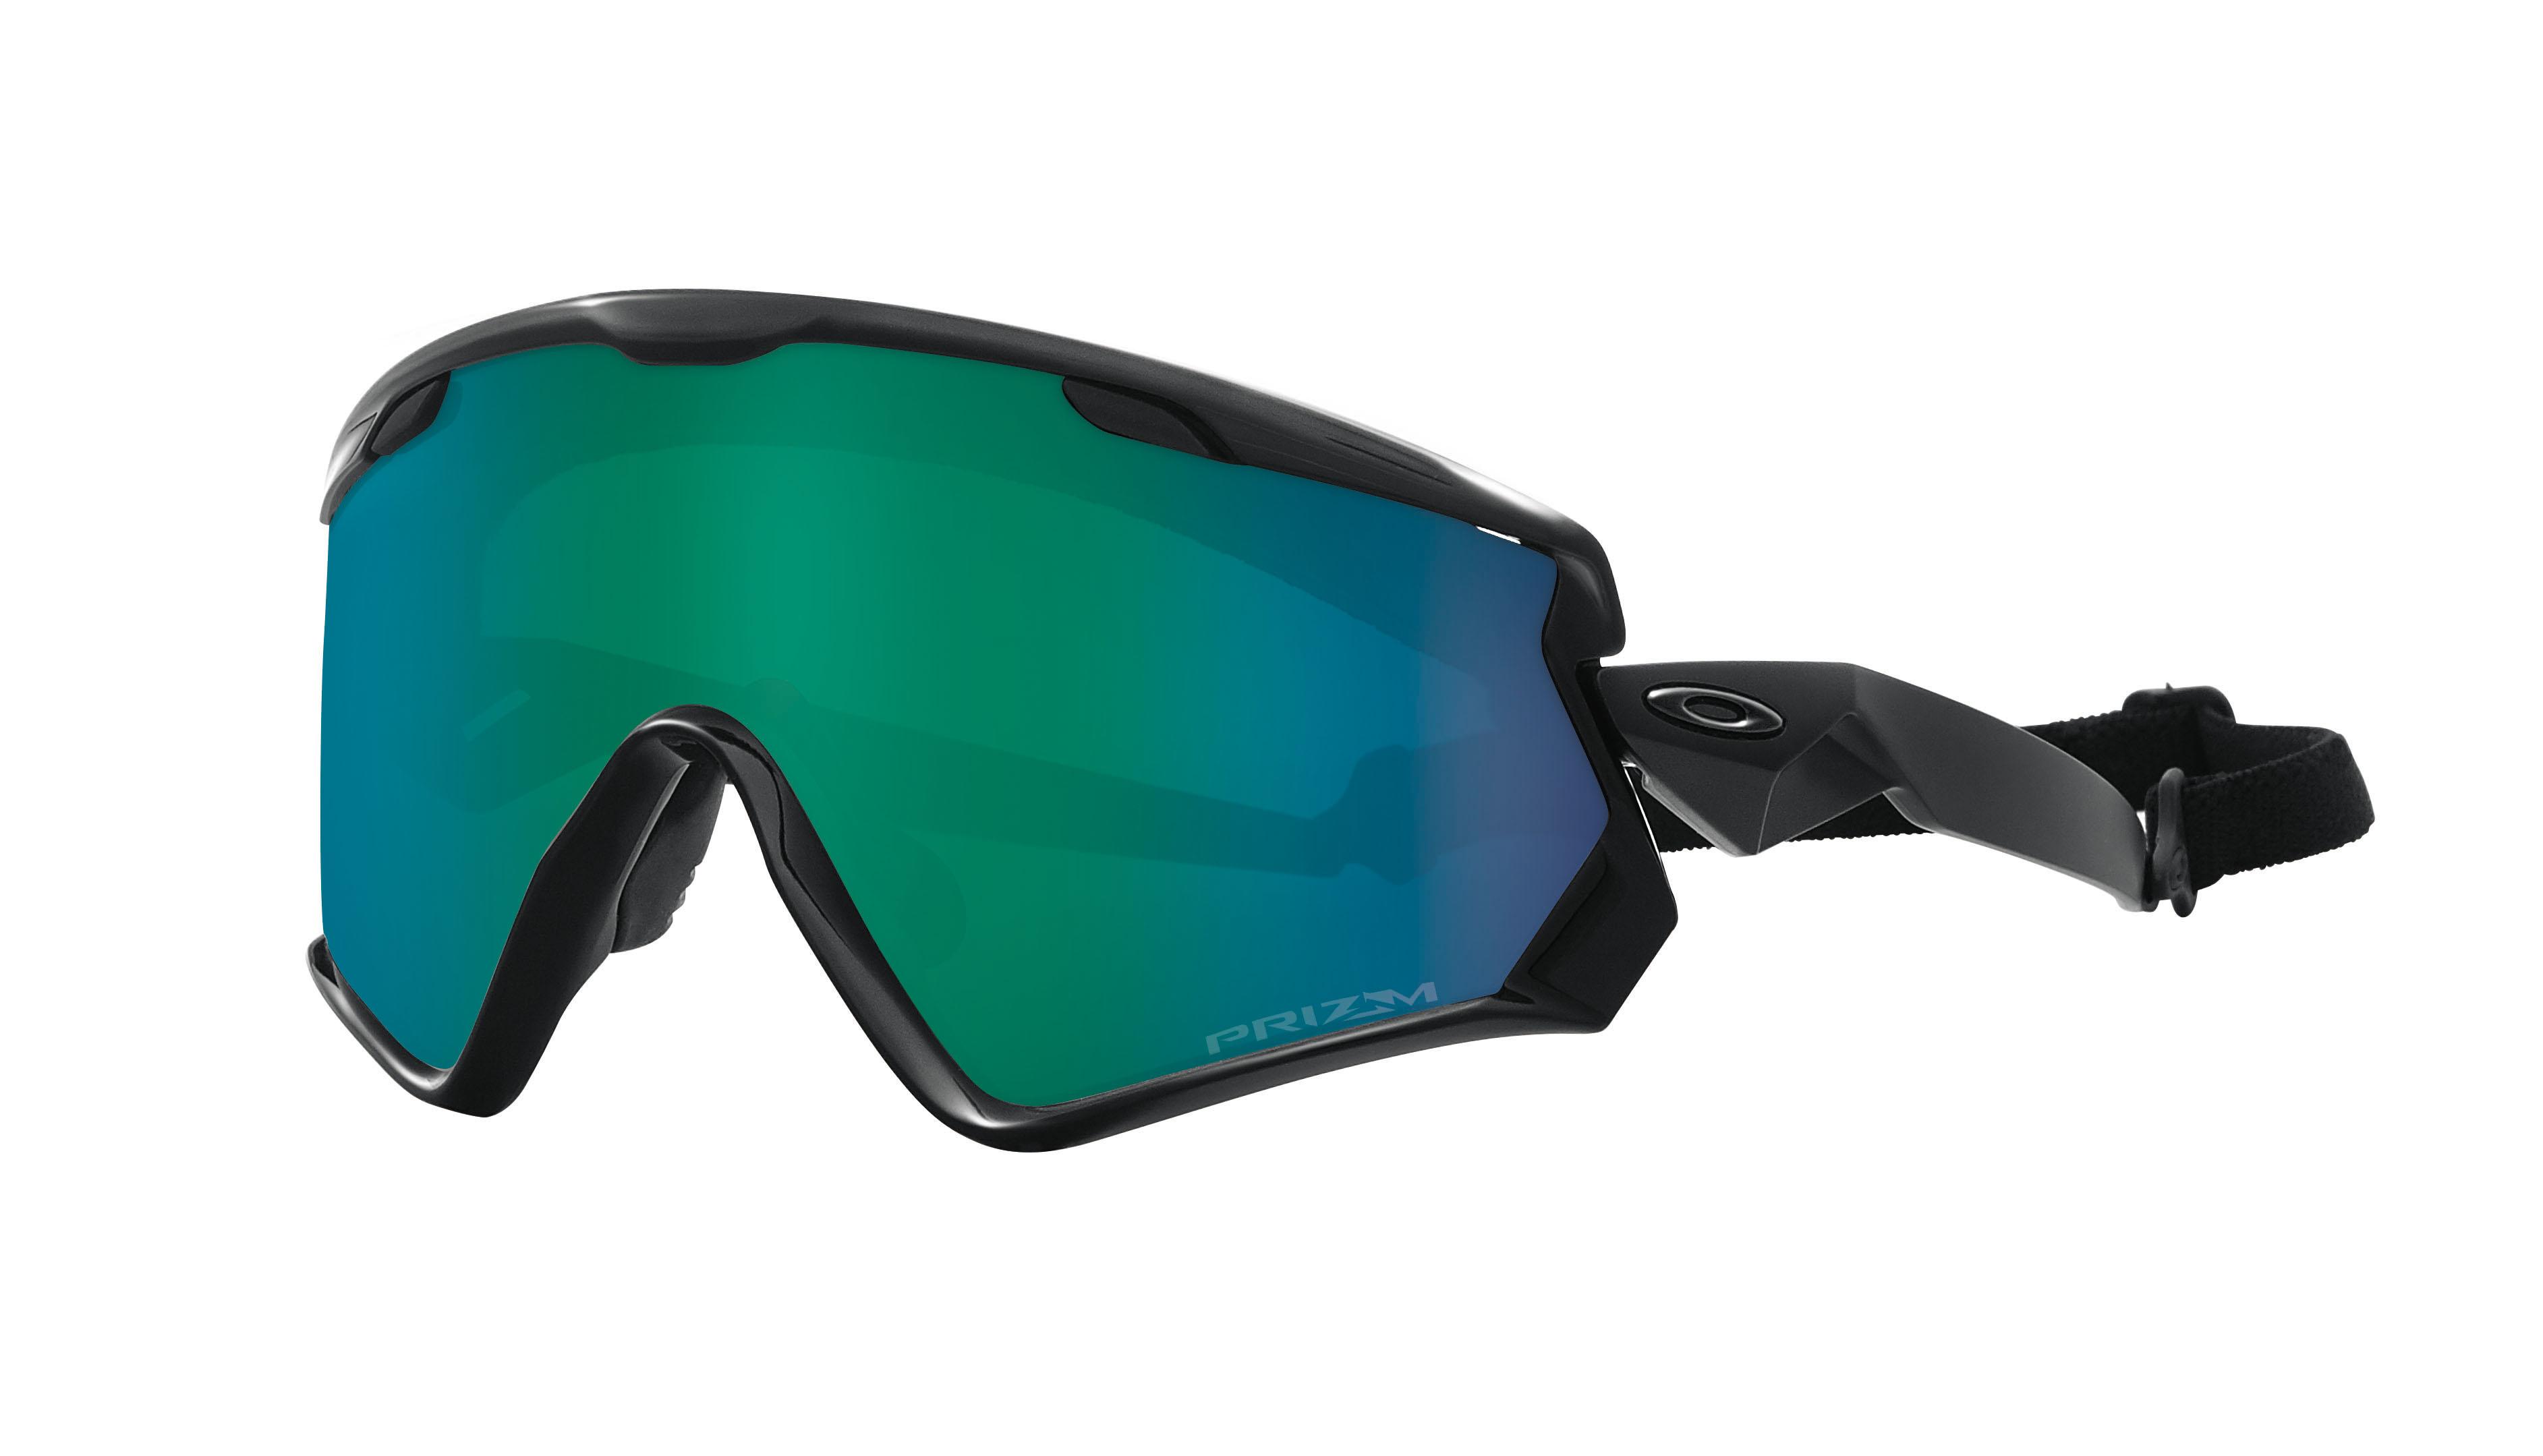 22340a55ca Oakley WindJacket2.0 OO7072-01 Matte-Black-PrizmJadeIrid